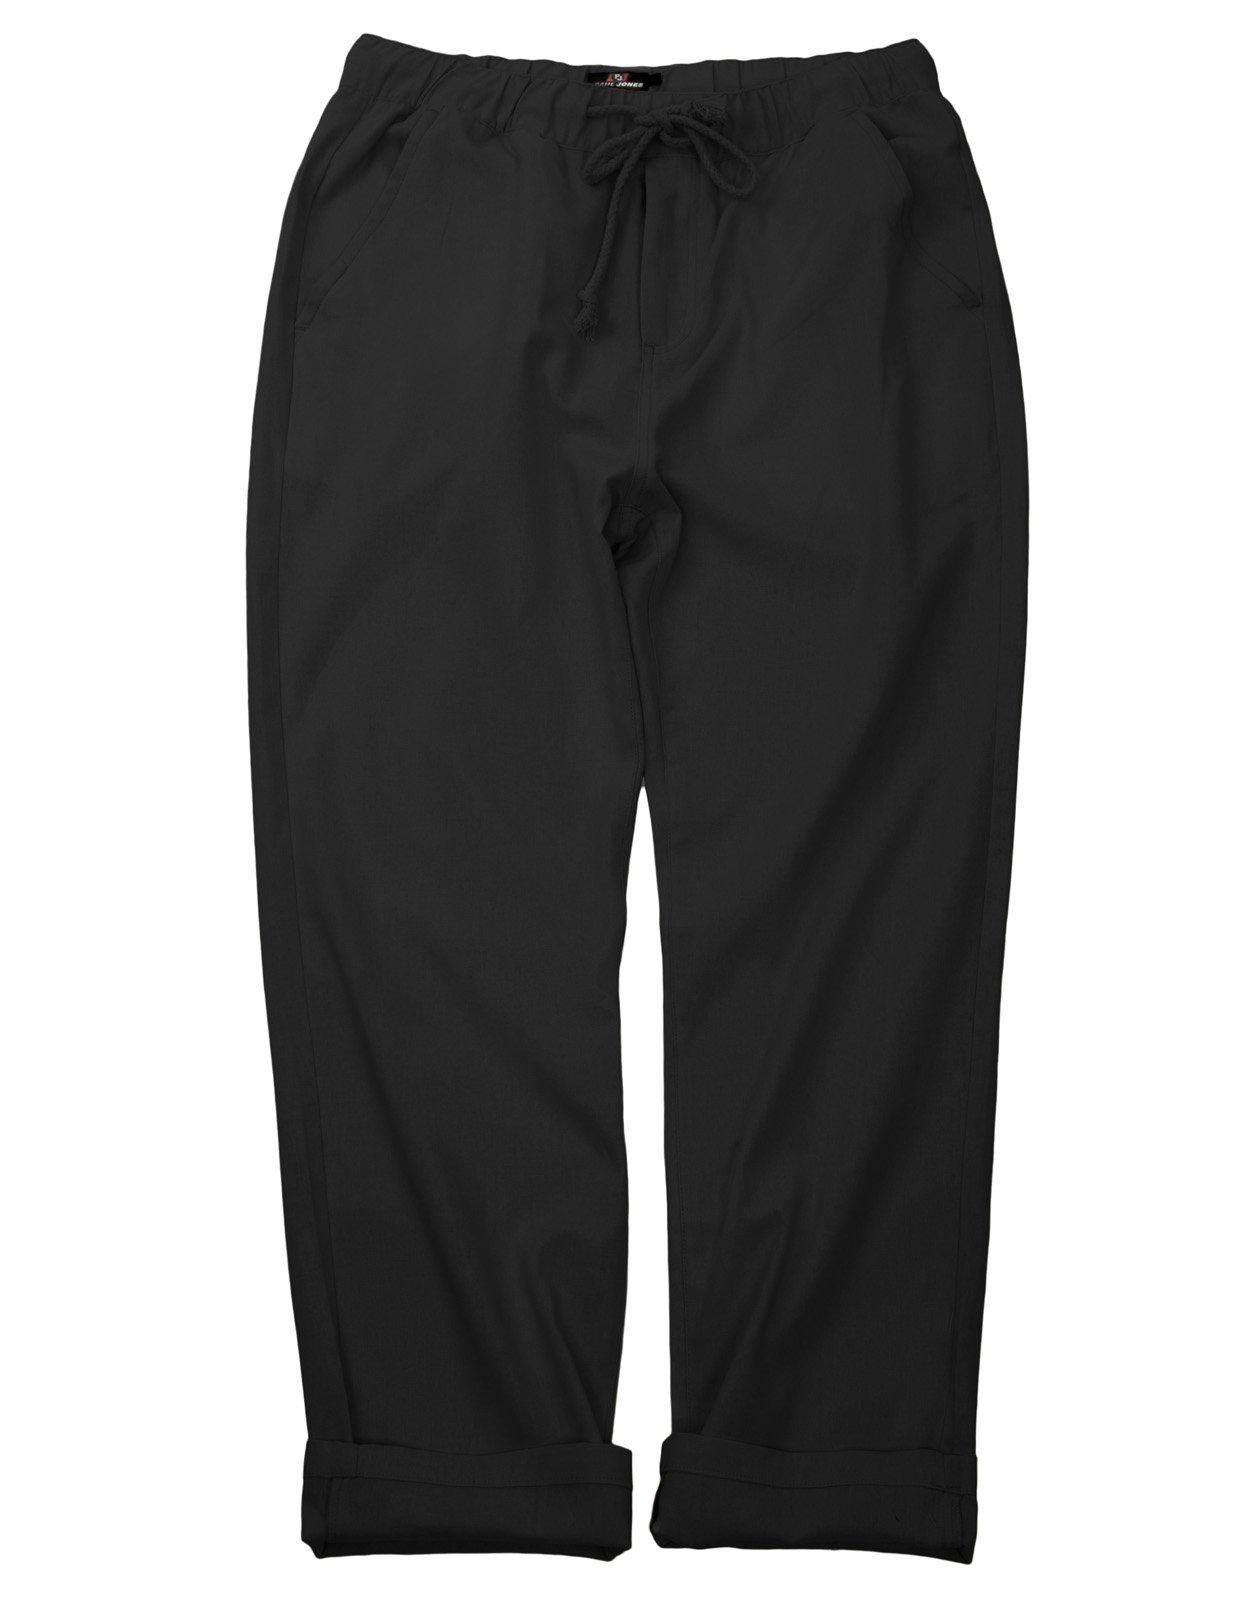 PAUL JONES Men's Linen Summer Pants Elastic Waist Casual Pants